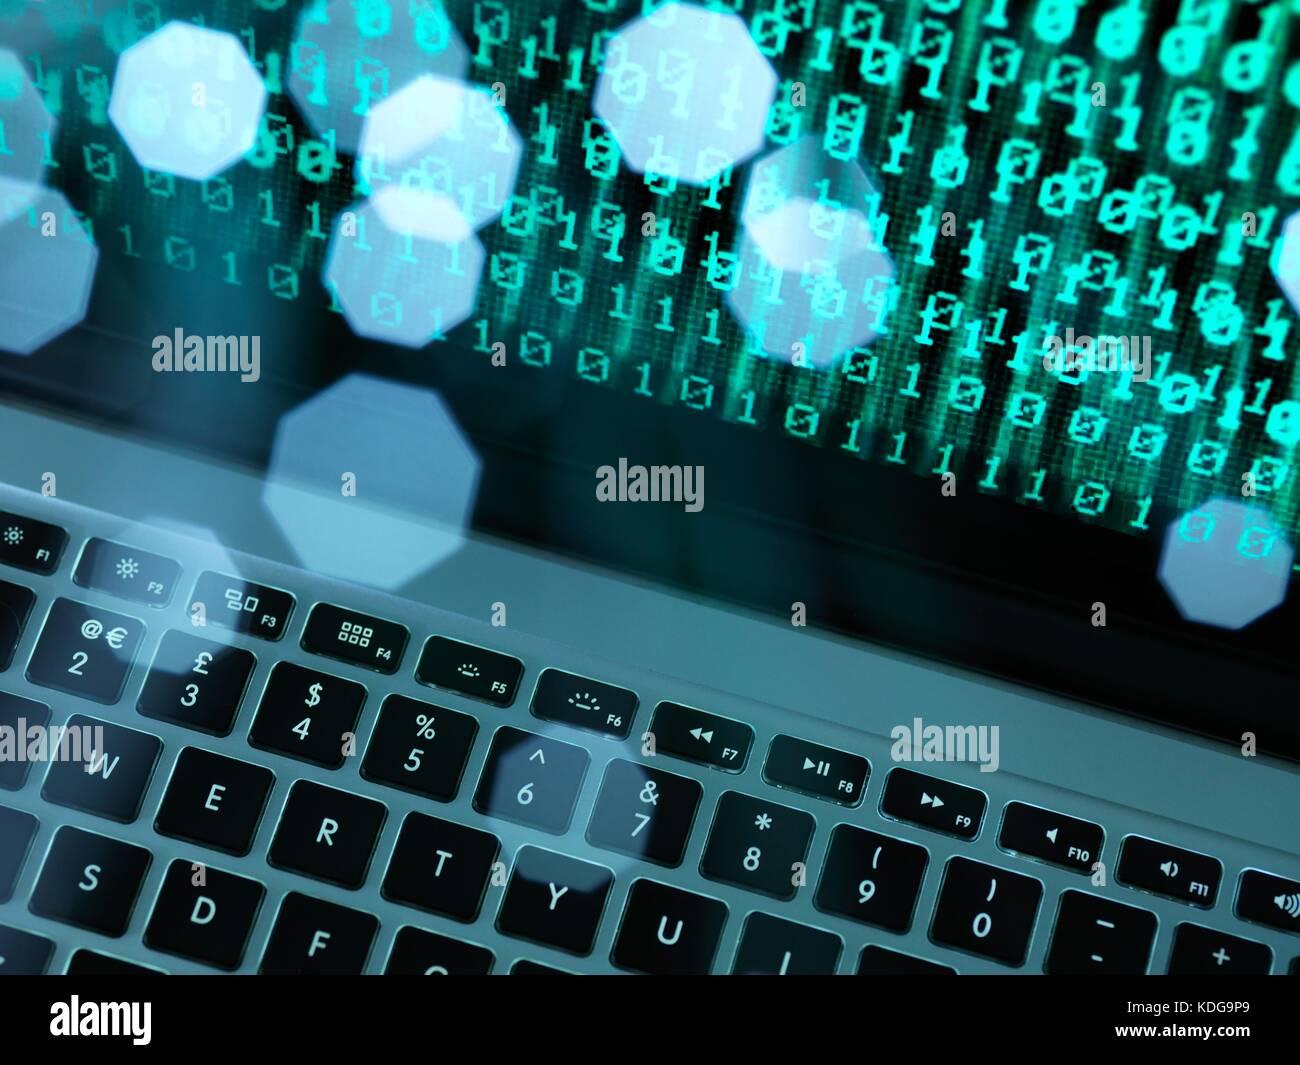 Fibre optic data containing a computer virus hitting a laptop screen. - Stock Image